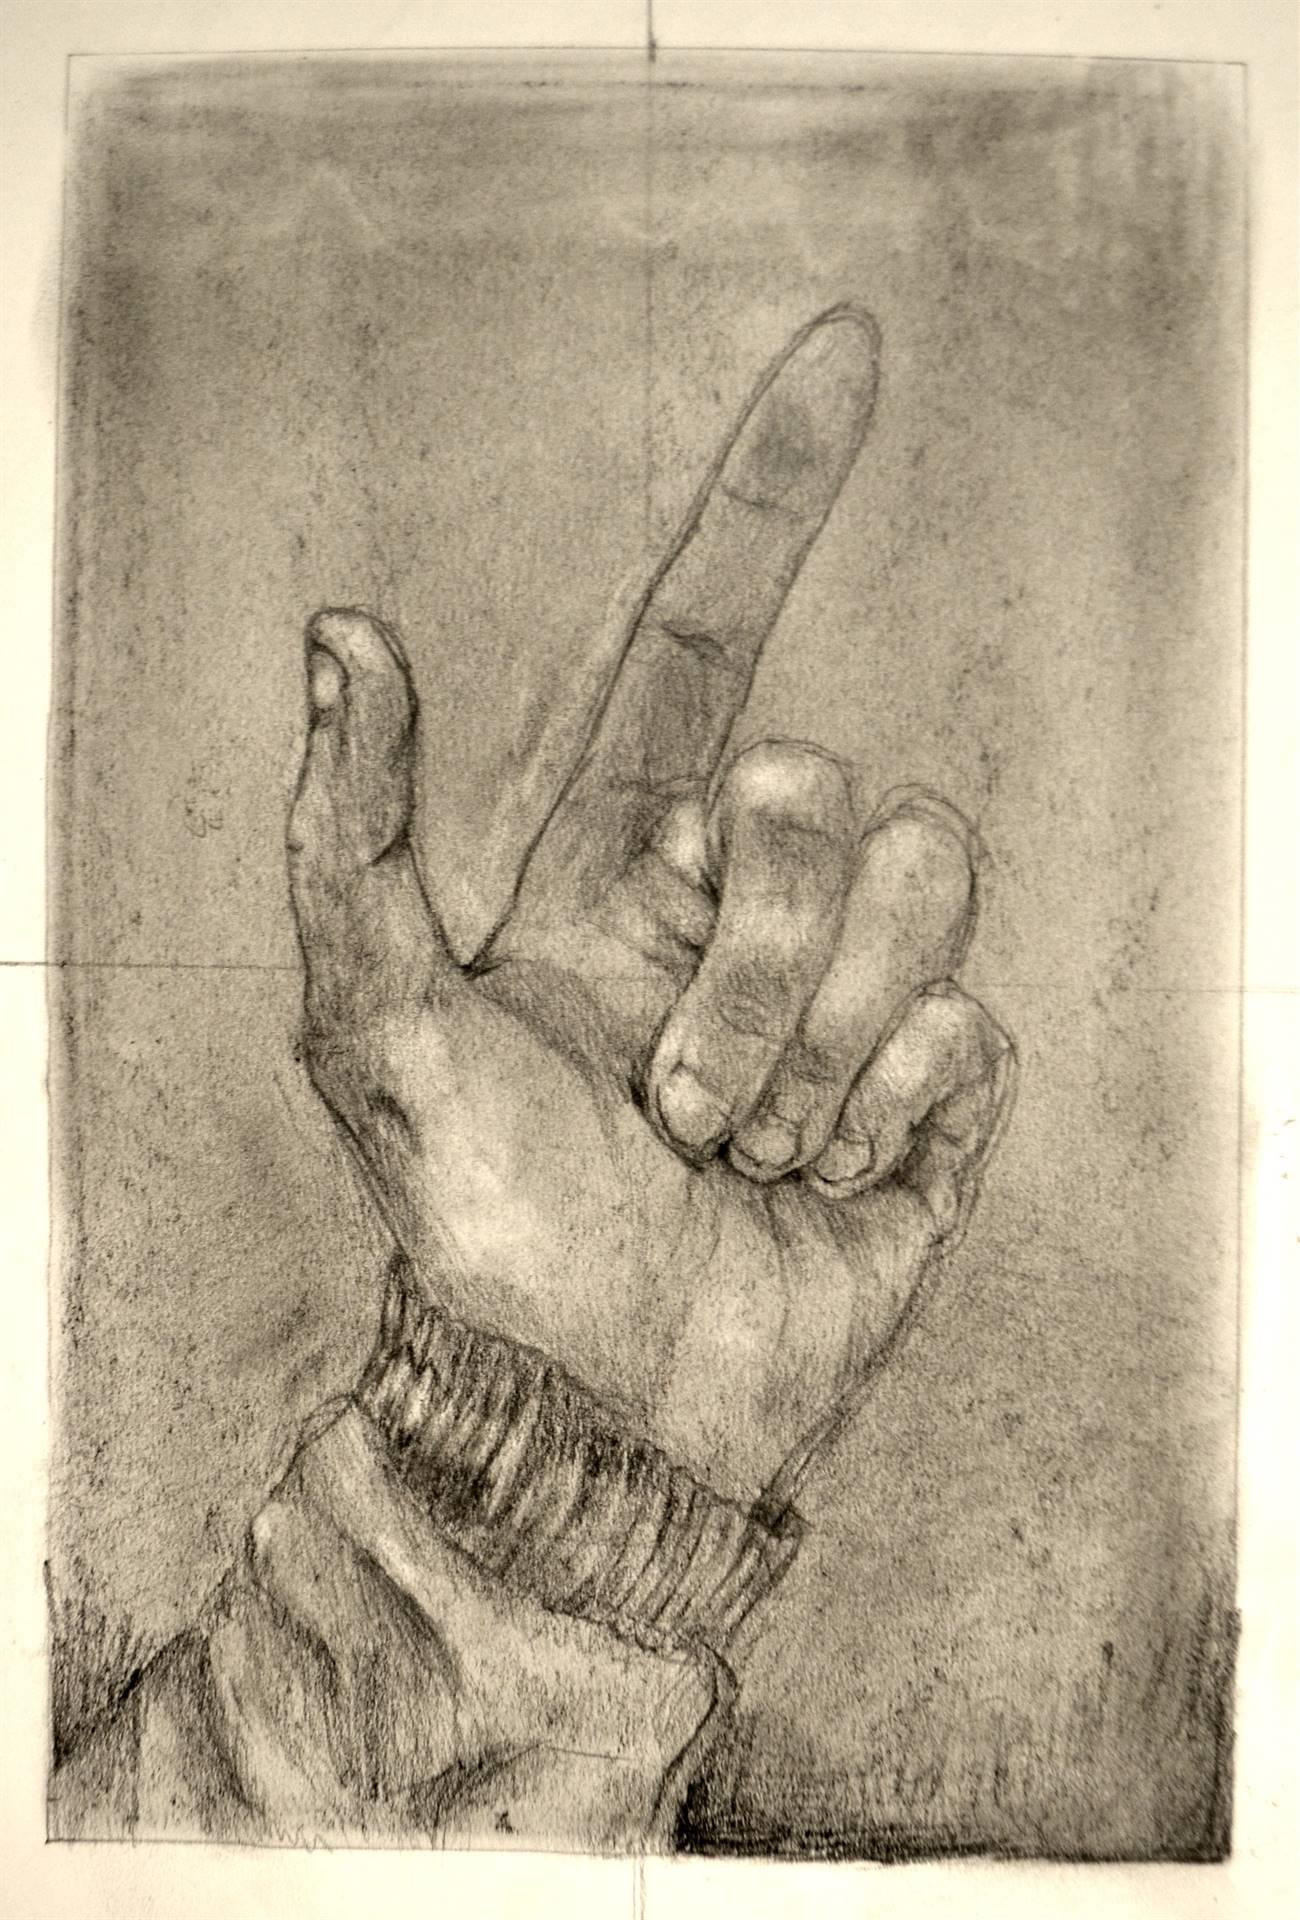 Bethann Cristantiello, modified contour of my hand, graphite, 12 x 9, 2016